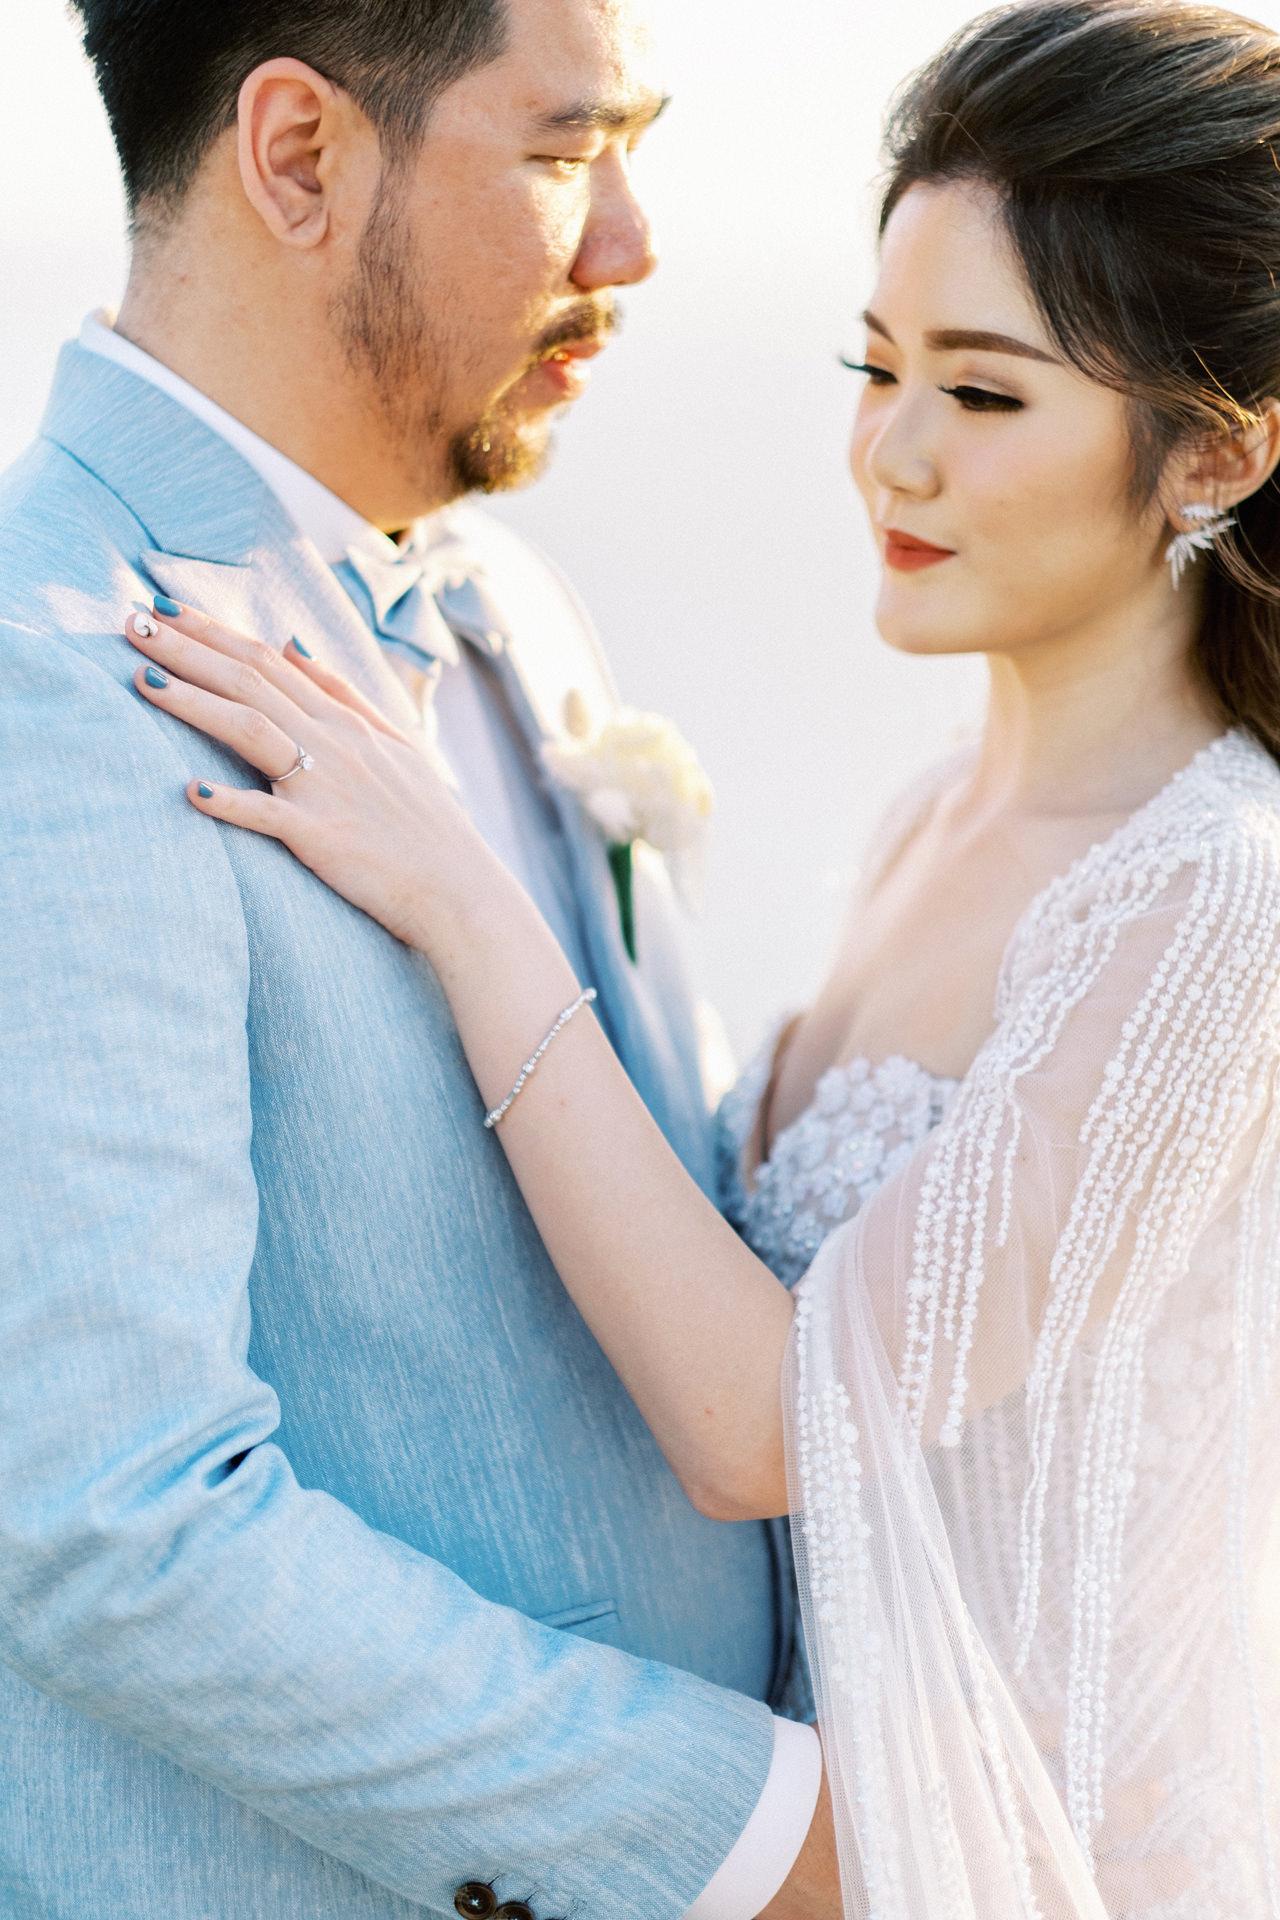 M&S: Shades of Blue Villa Plenilunio Bali Wedding 71